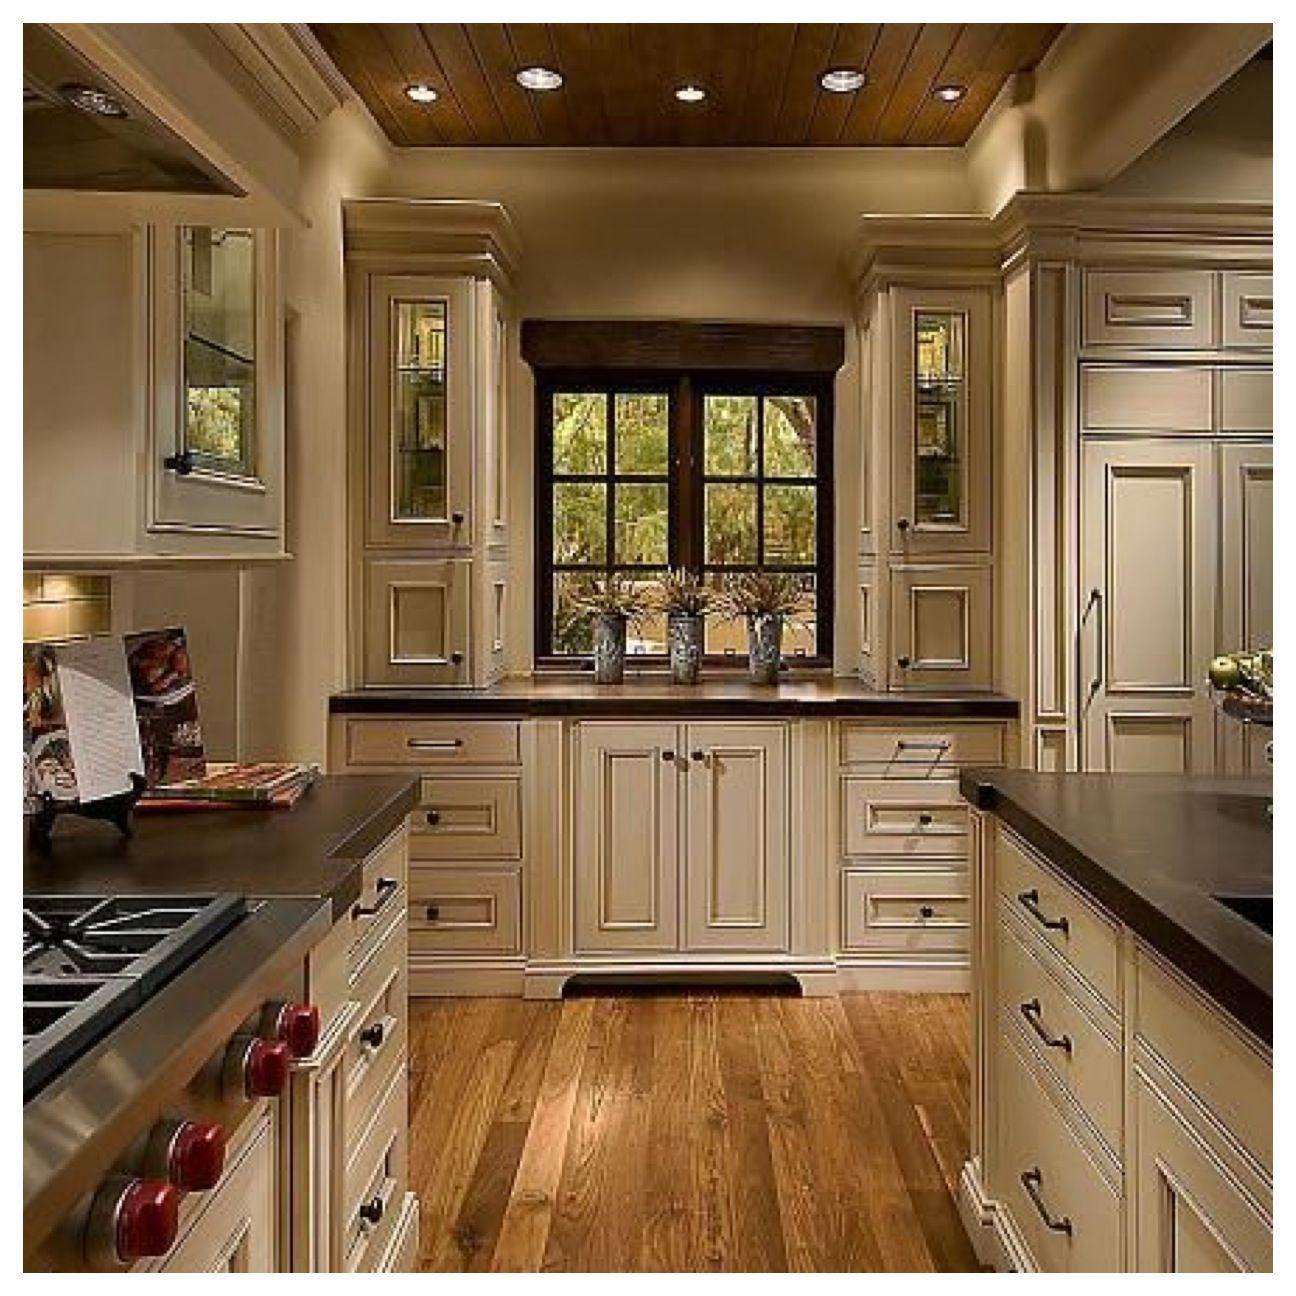 Cool Antique Kitchen Cabinets Kitchen Cabinet Design Antique White Kitchen Kitchen Cabinet Layout